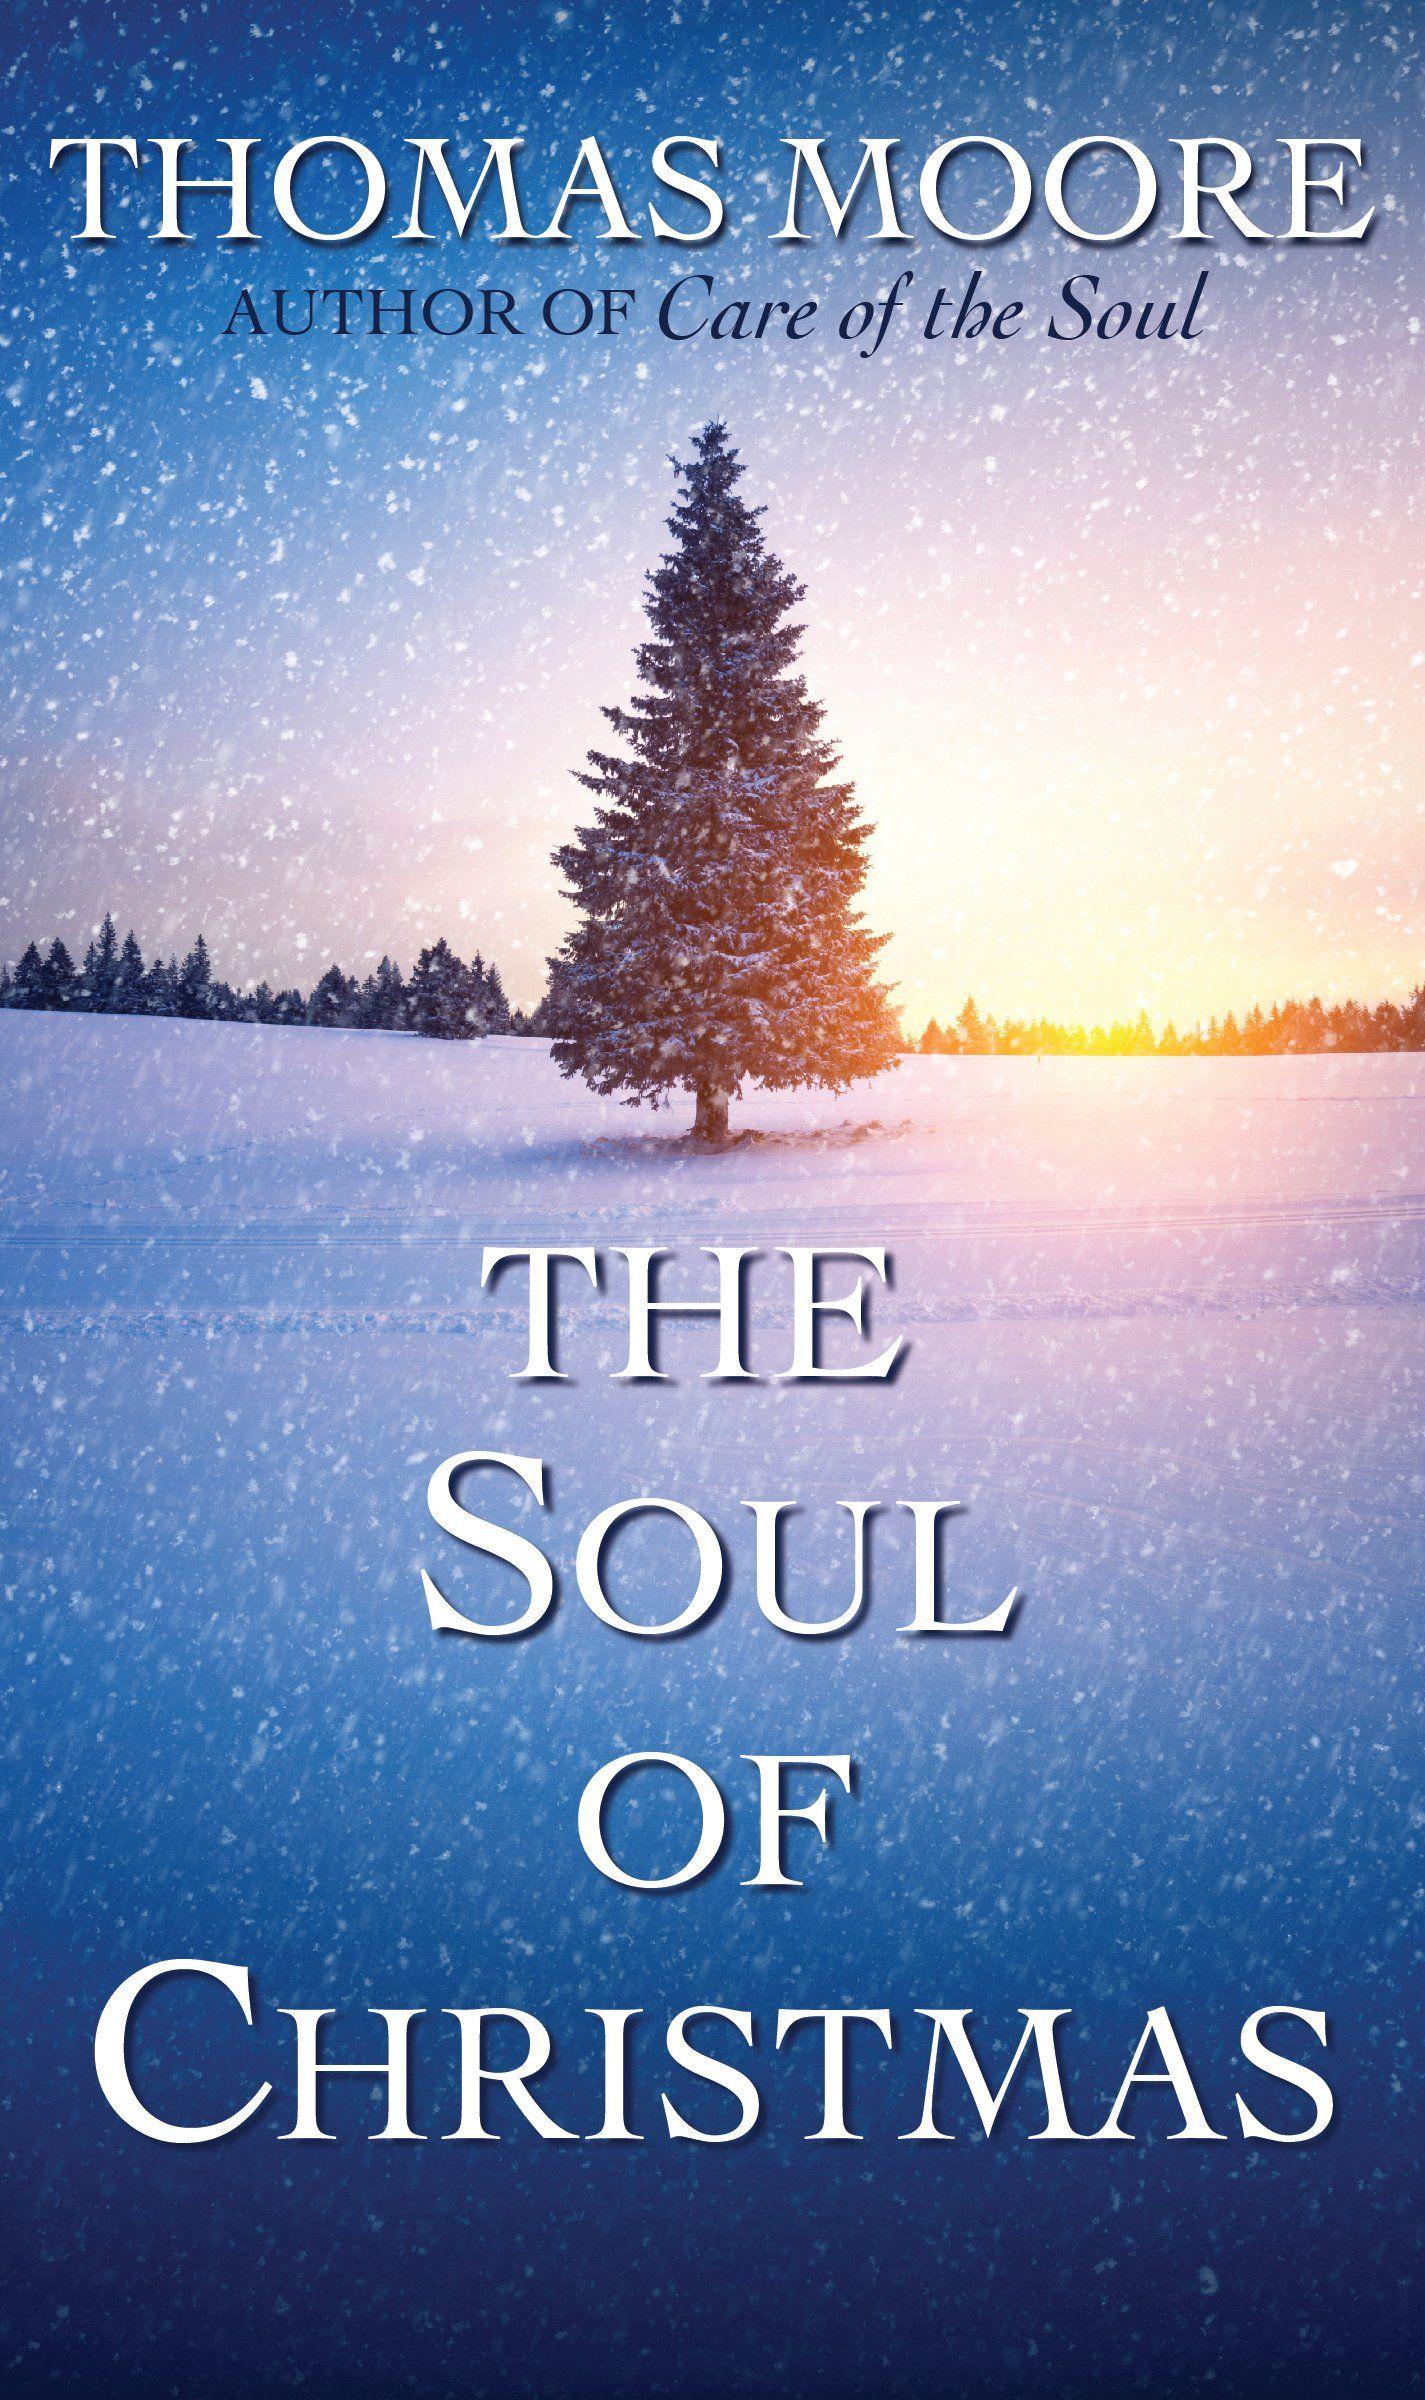 The Soul of Christmas: Thomas Moore: 9781632531209: Amazon.com: Books